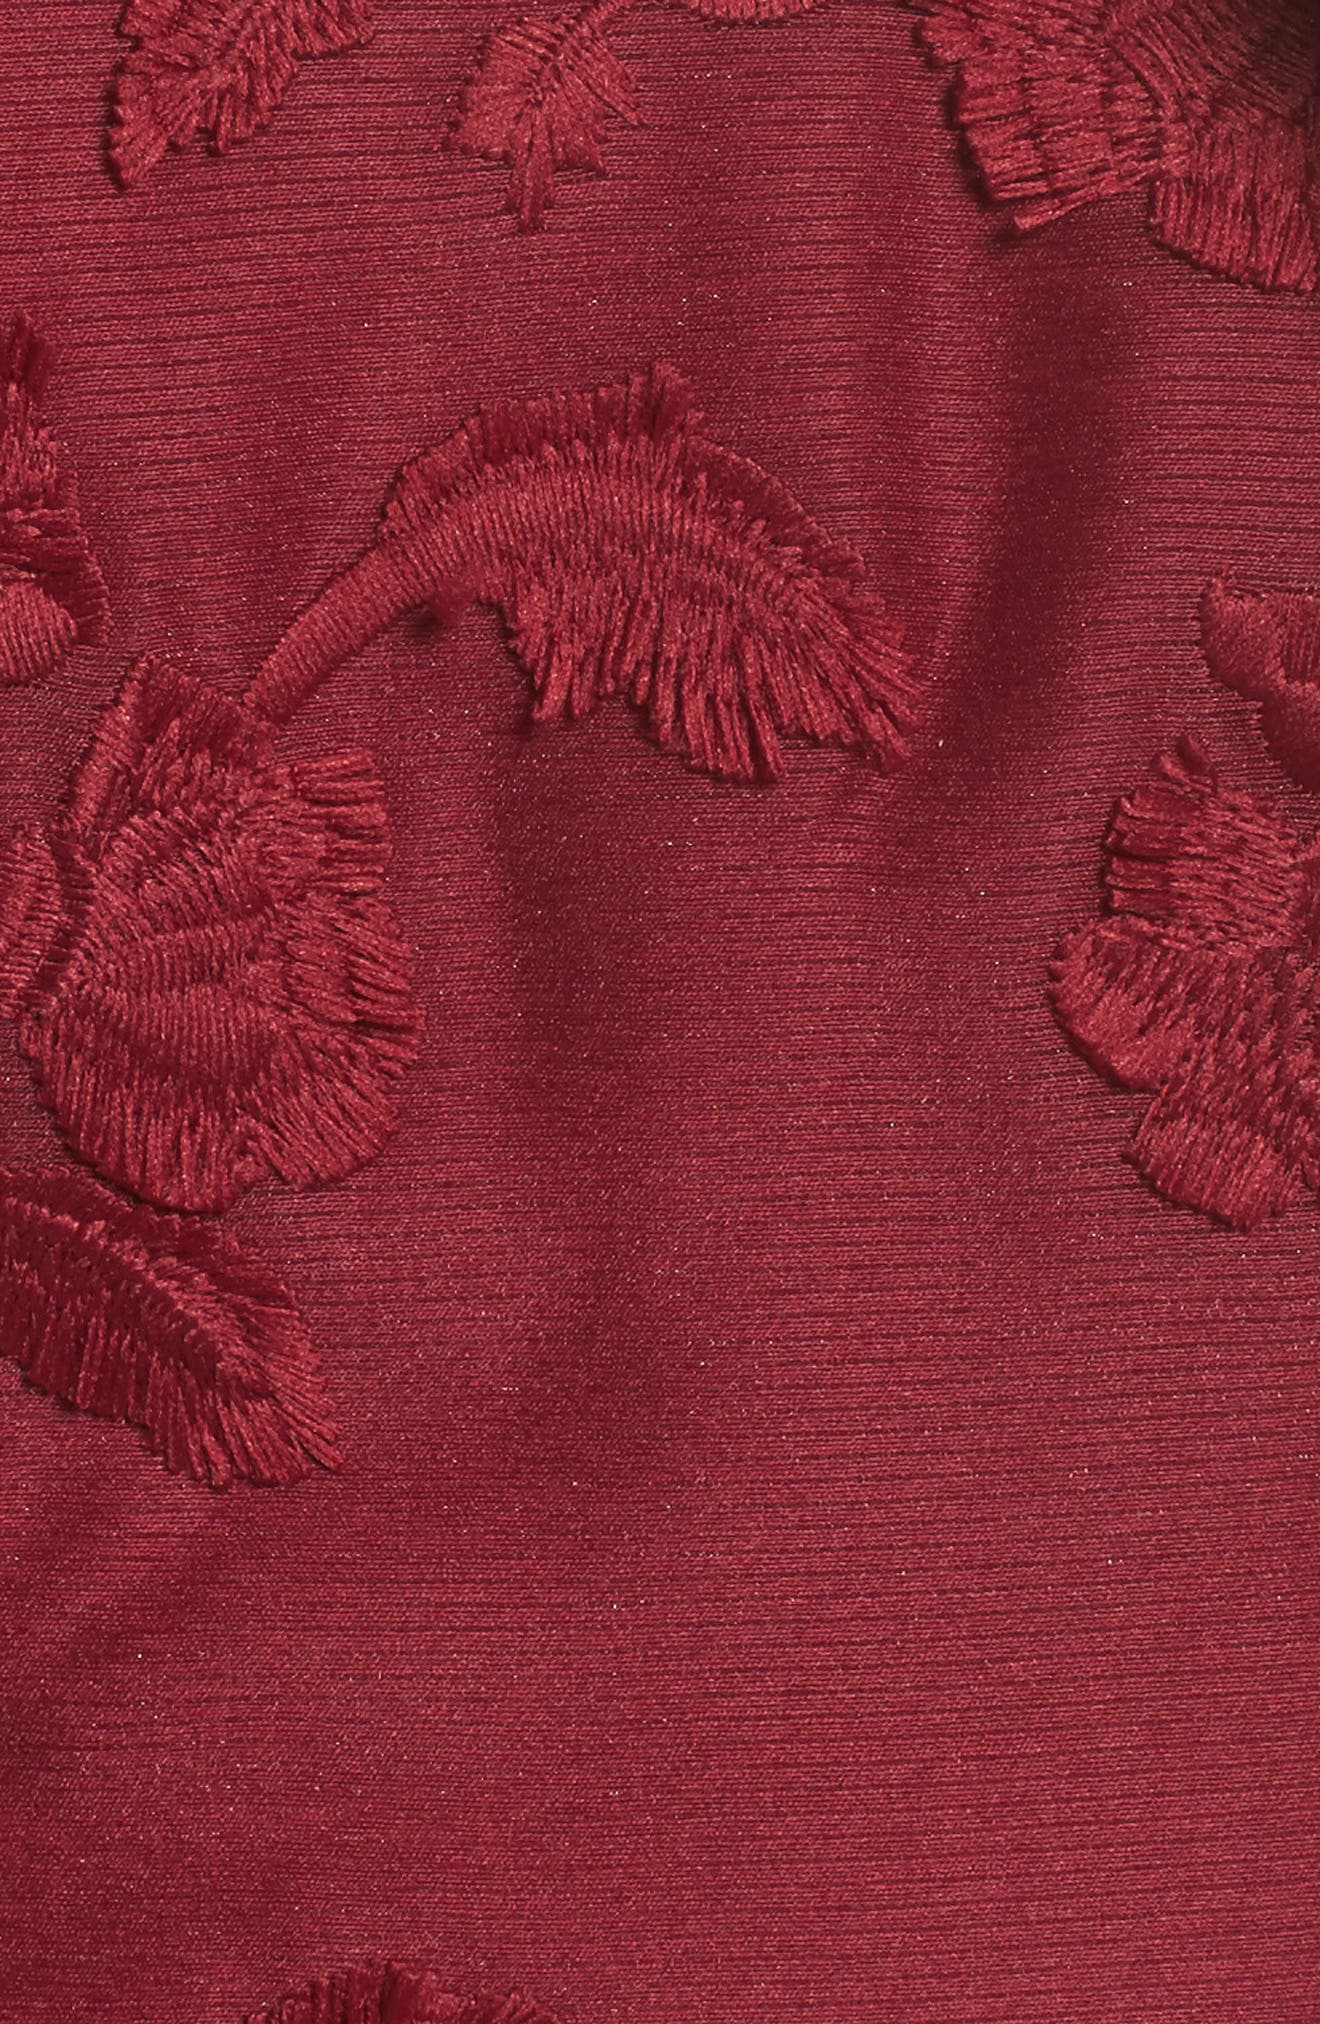 Shine Ruffle Lace Tea Length Dress,                             Alternate thumbnail 5, color,